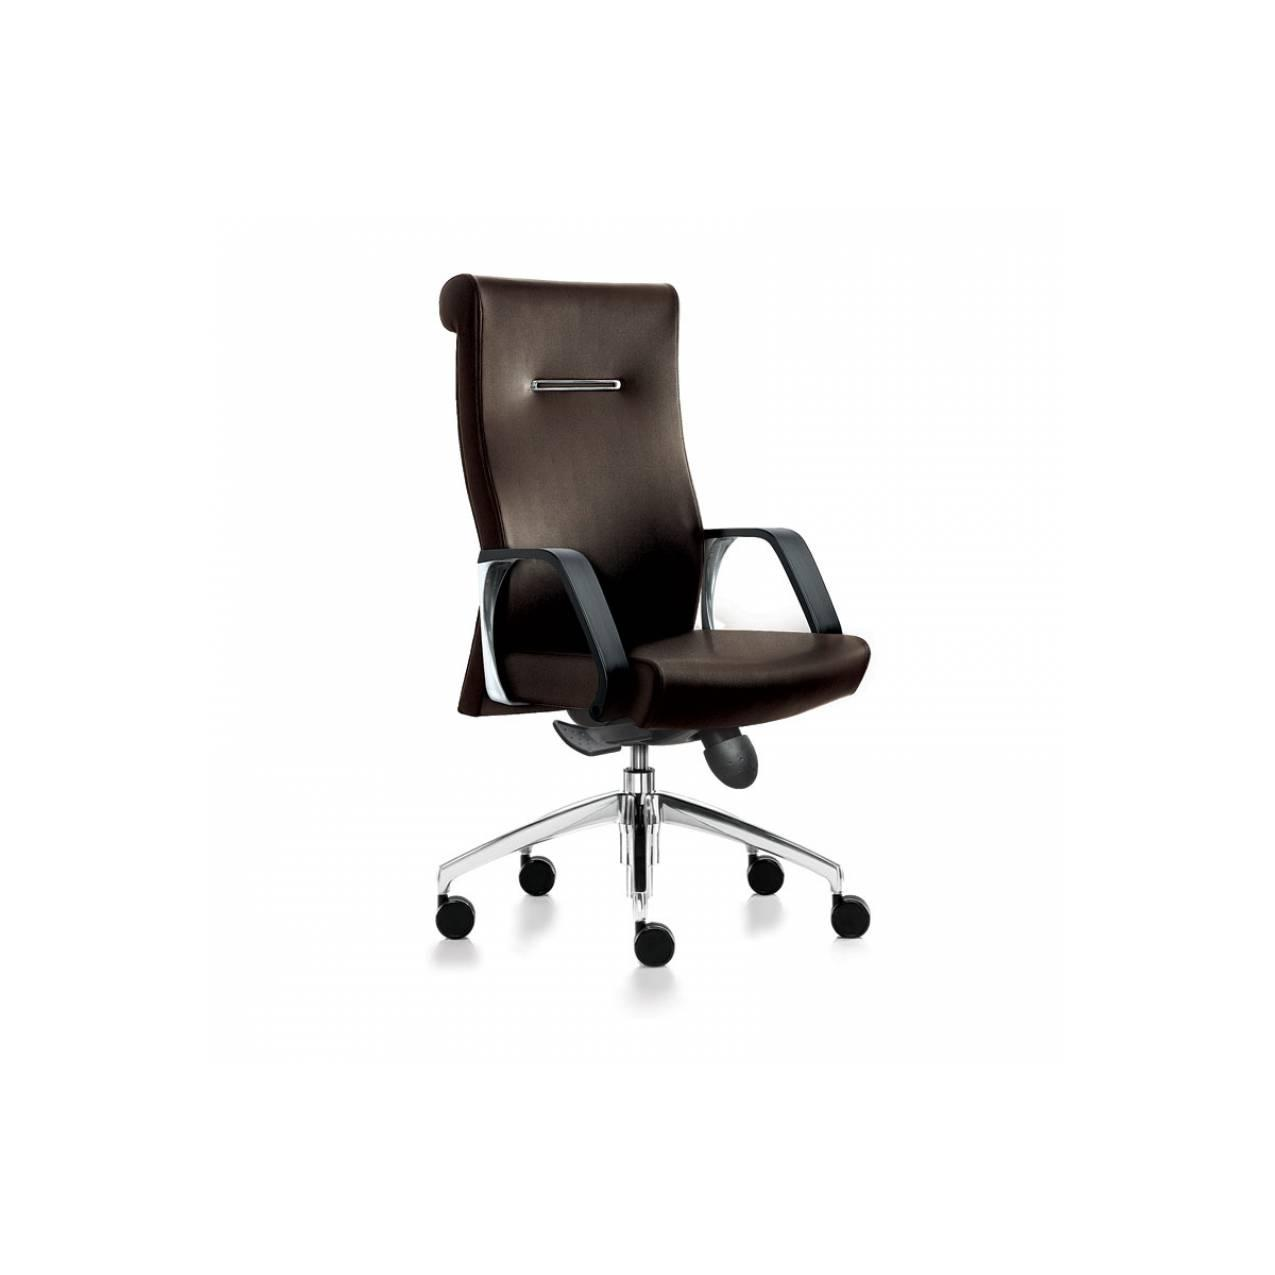 kursi kantor direktur indachi modern design,ergonomis dan nyaman